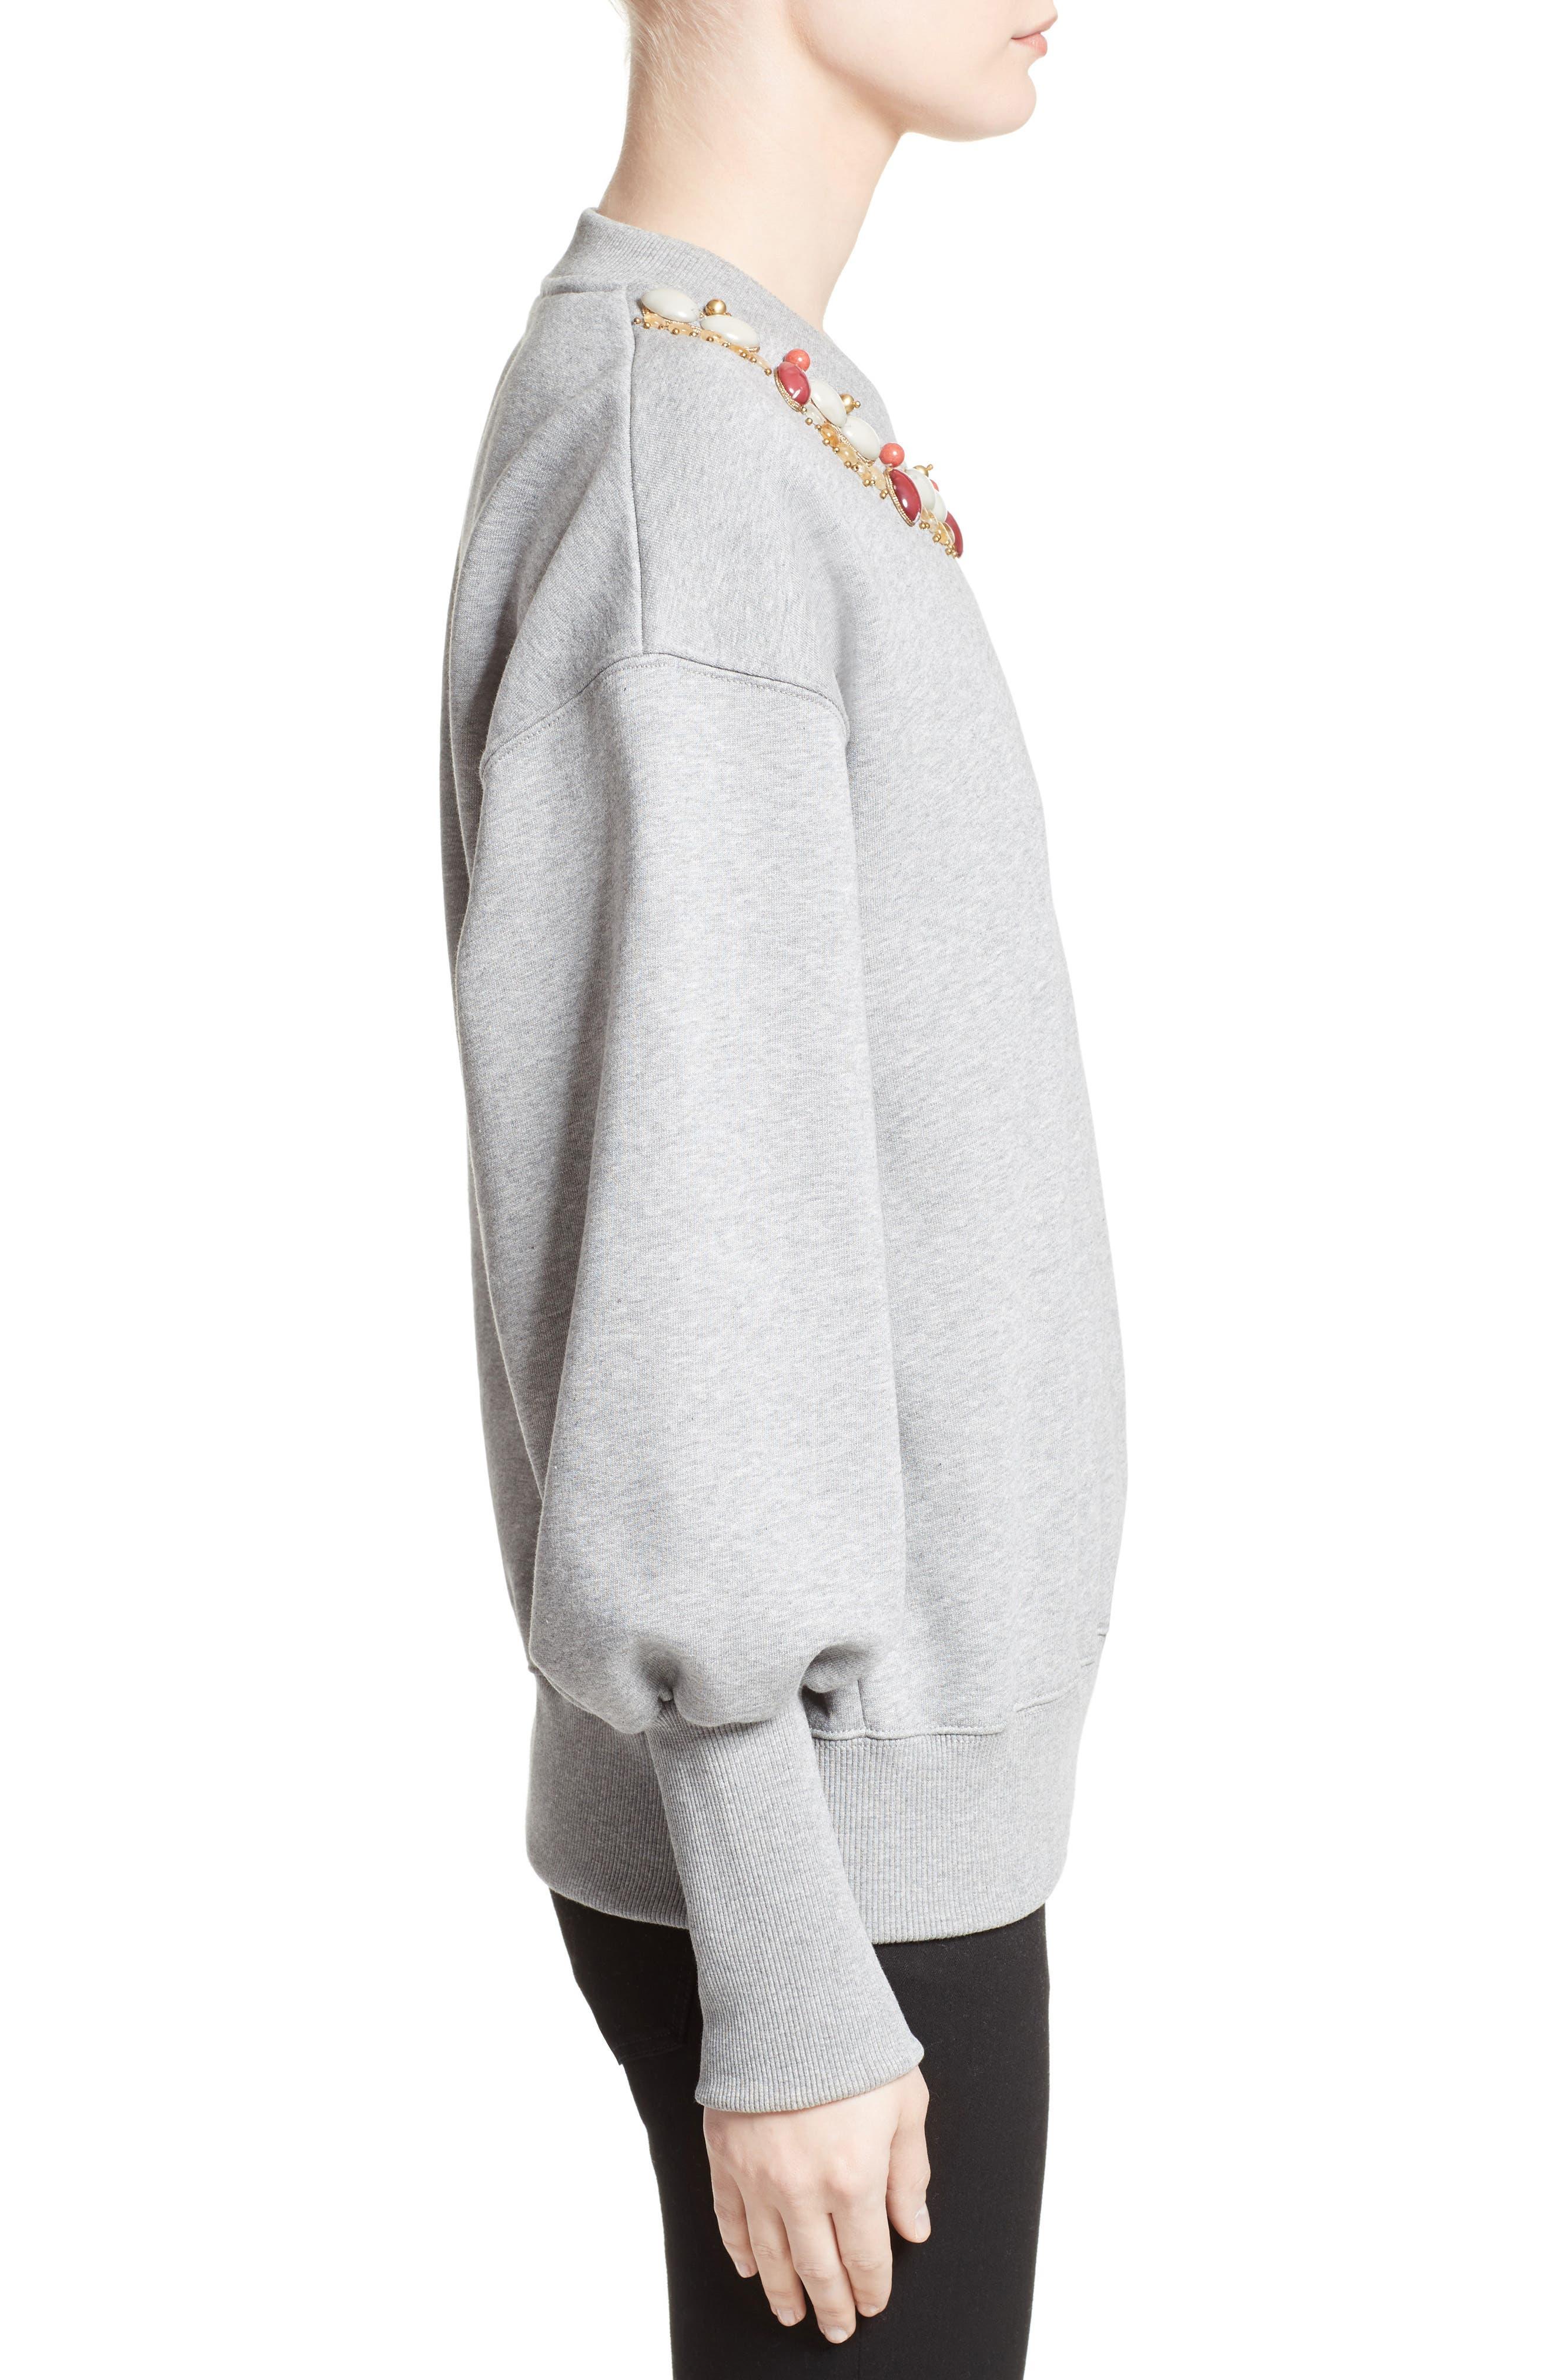 Juliano Embellished Sweatshirt,                             Alternate thumbnail 5, color,                             Pale Grey Melange